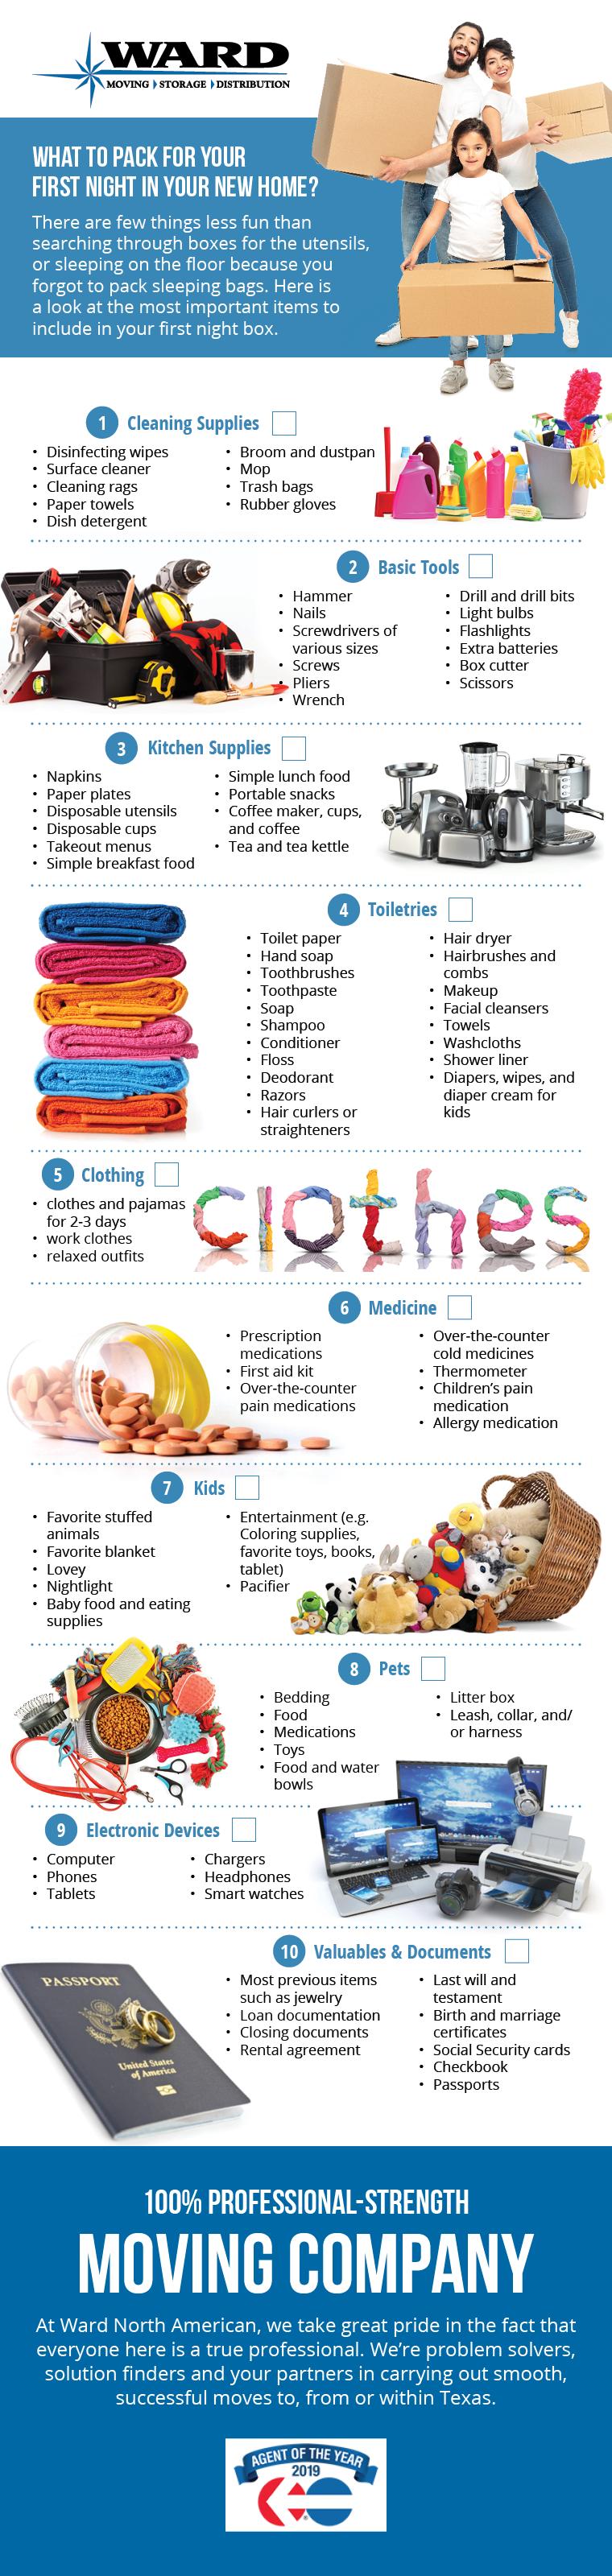 Moving essentials infographic